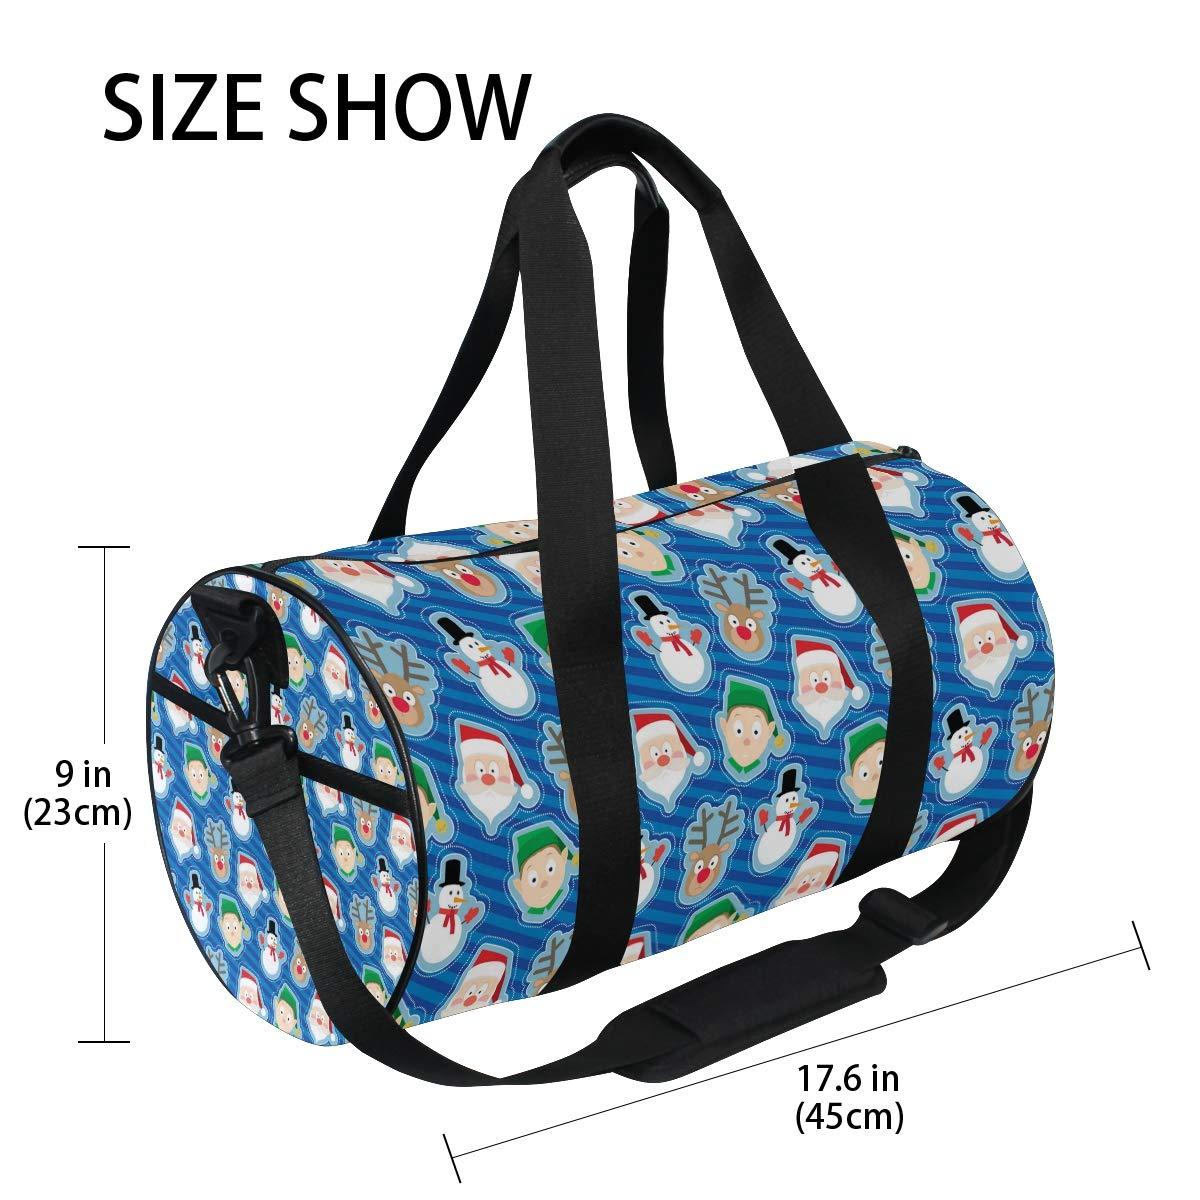 Pop Nightmare Before Christmas Popular casual fitness bag,Non-Slip Wearable Crossbody Bag Waterproof Shoulder Bag.